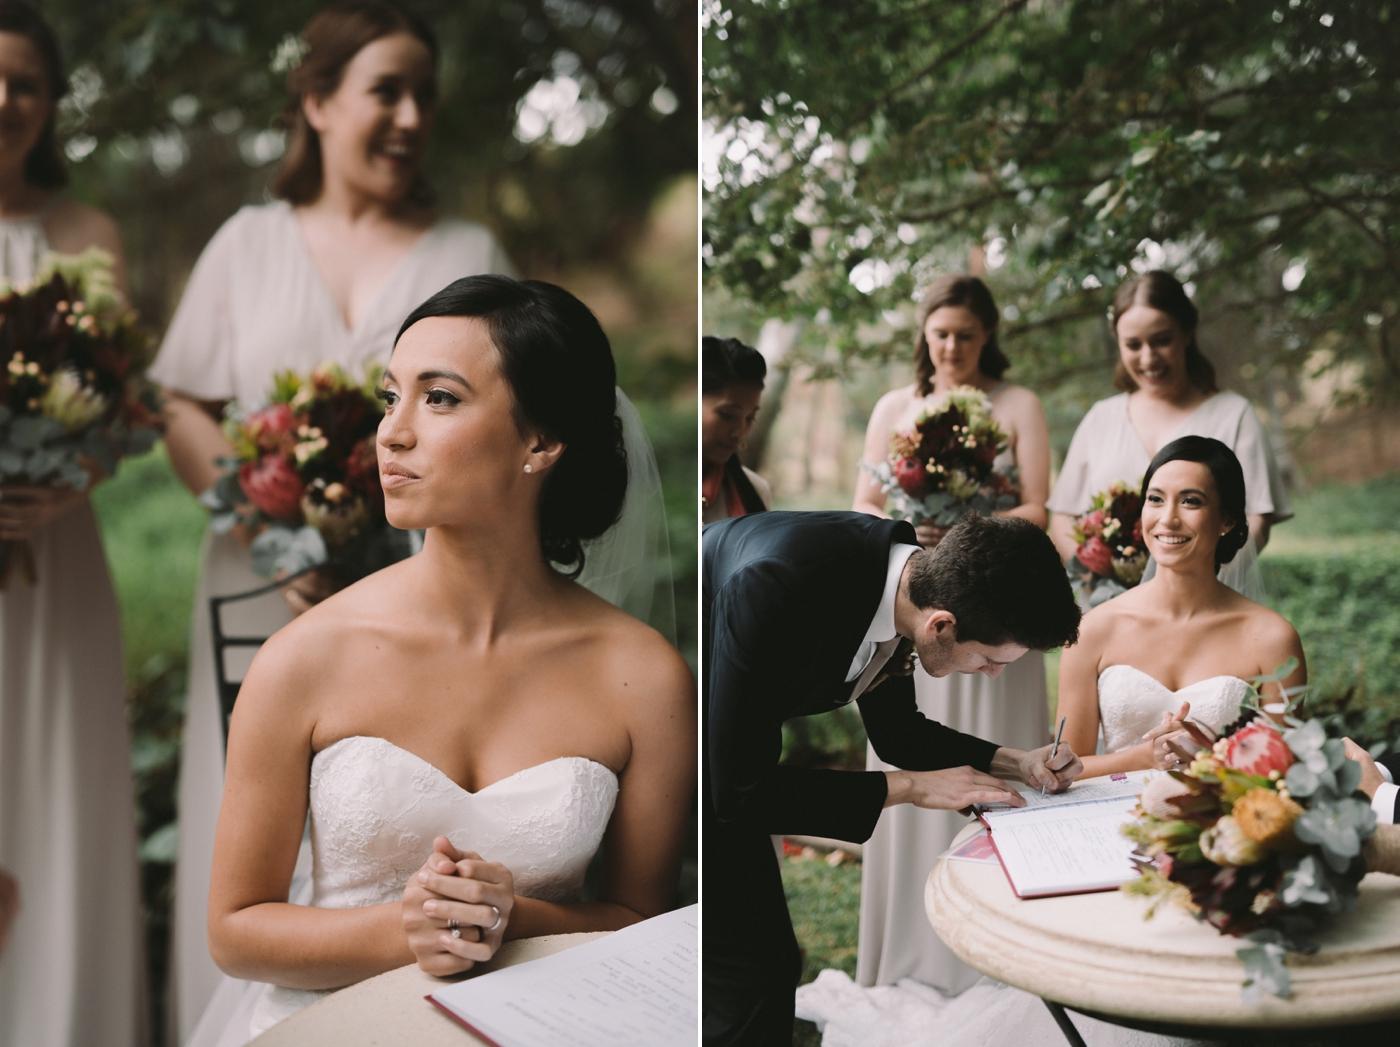 Jasmine and Adam - Natural wedding photographer in Adelaide - Candid Wedding Photographer Adelaide - www.katherineschultzphotography.com 27